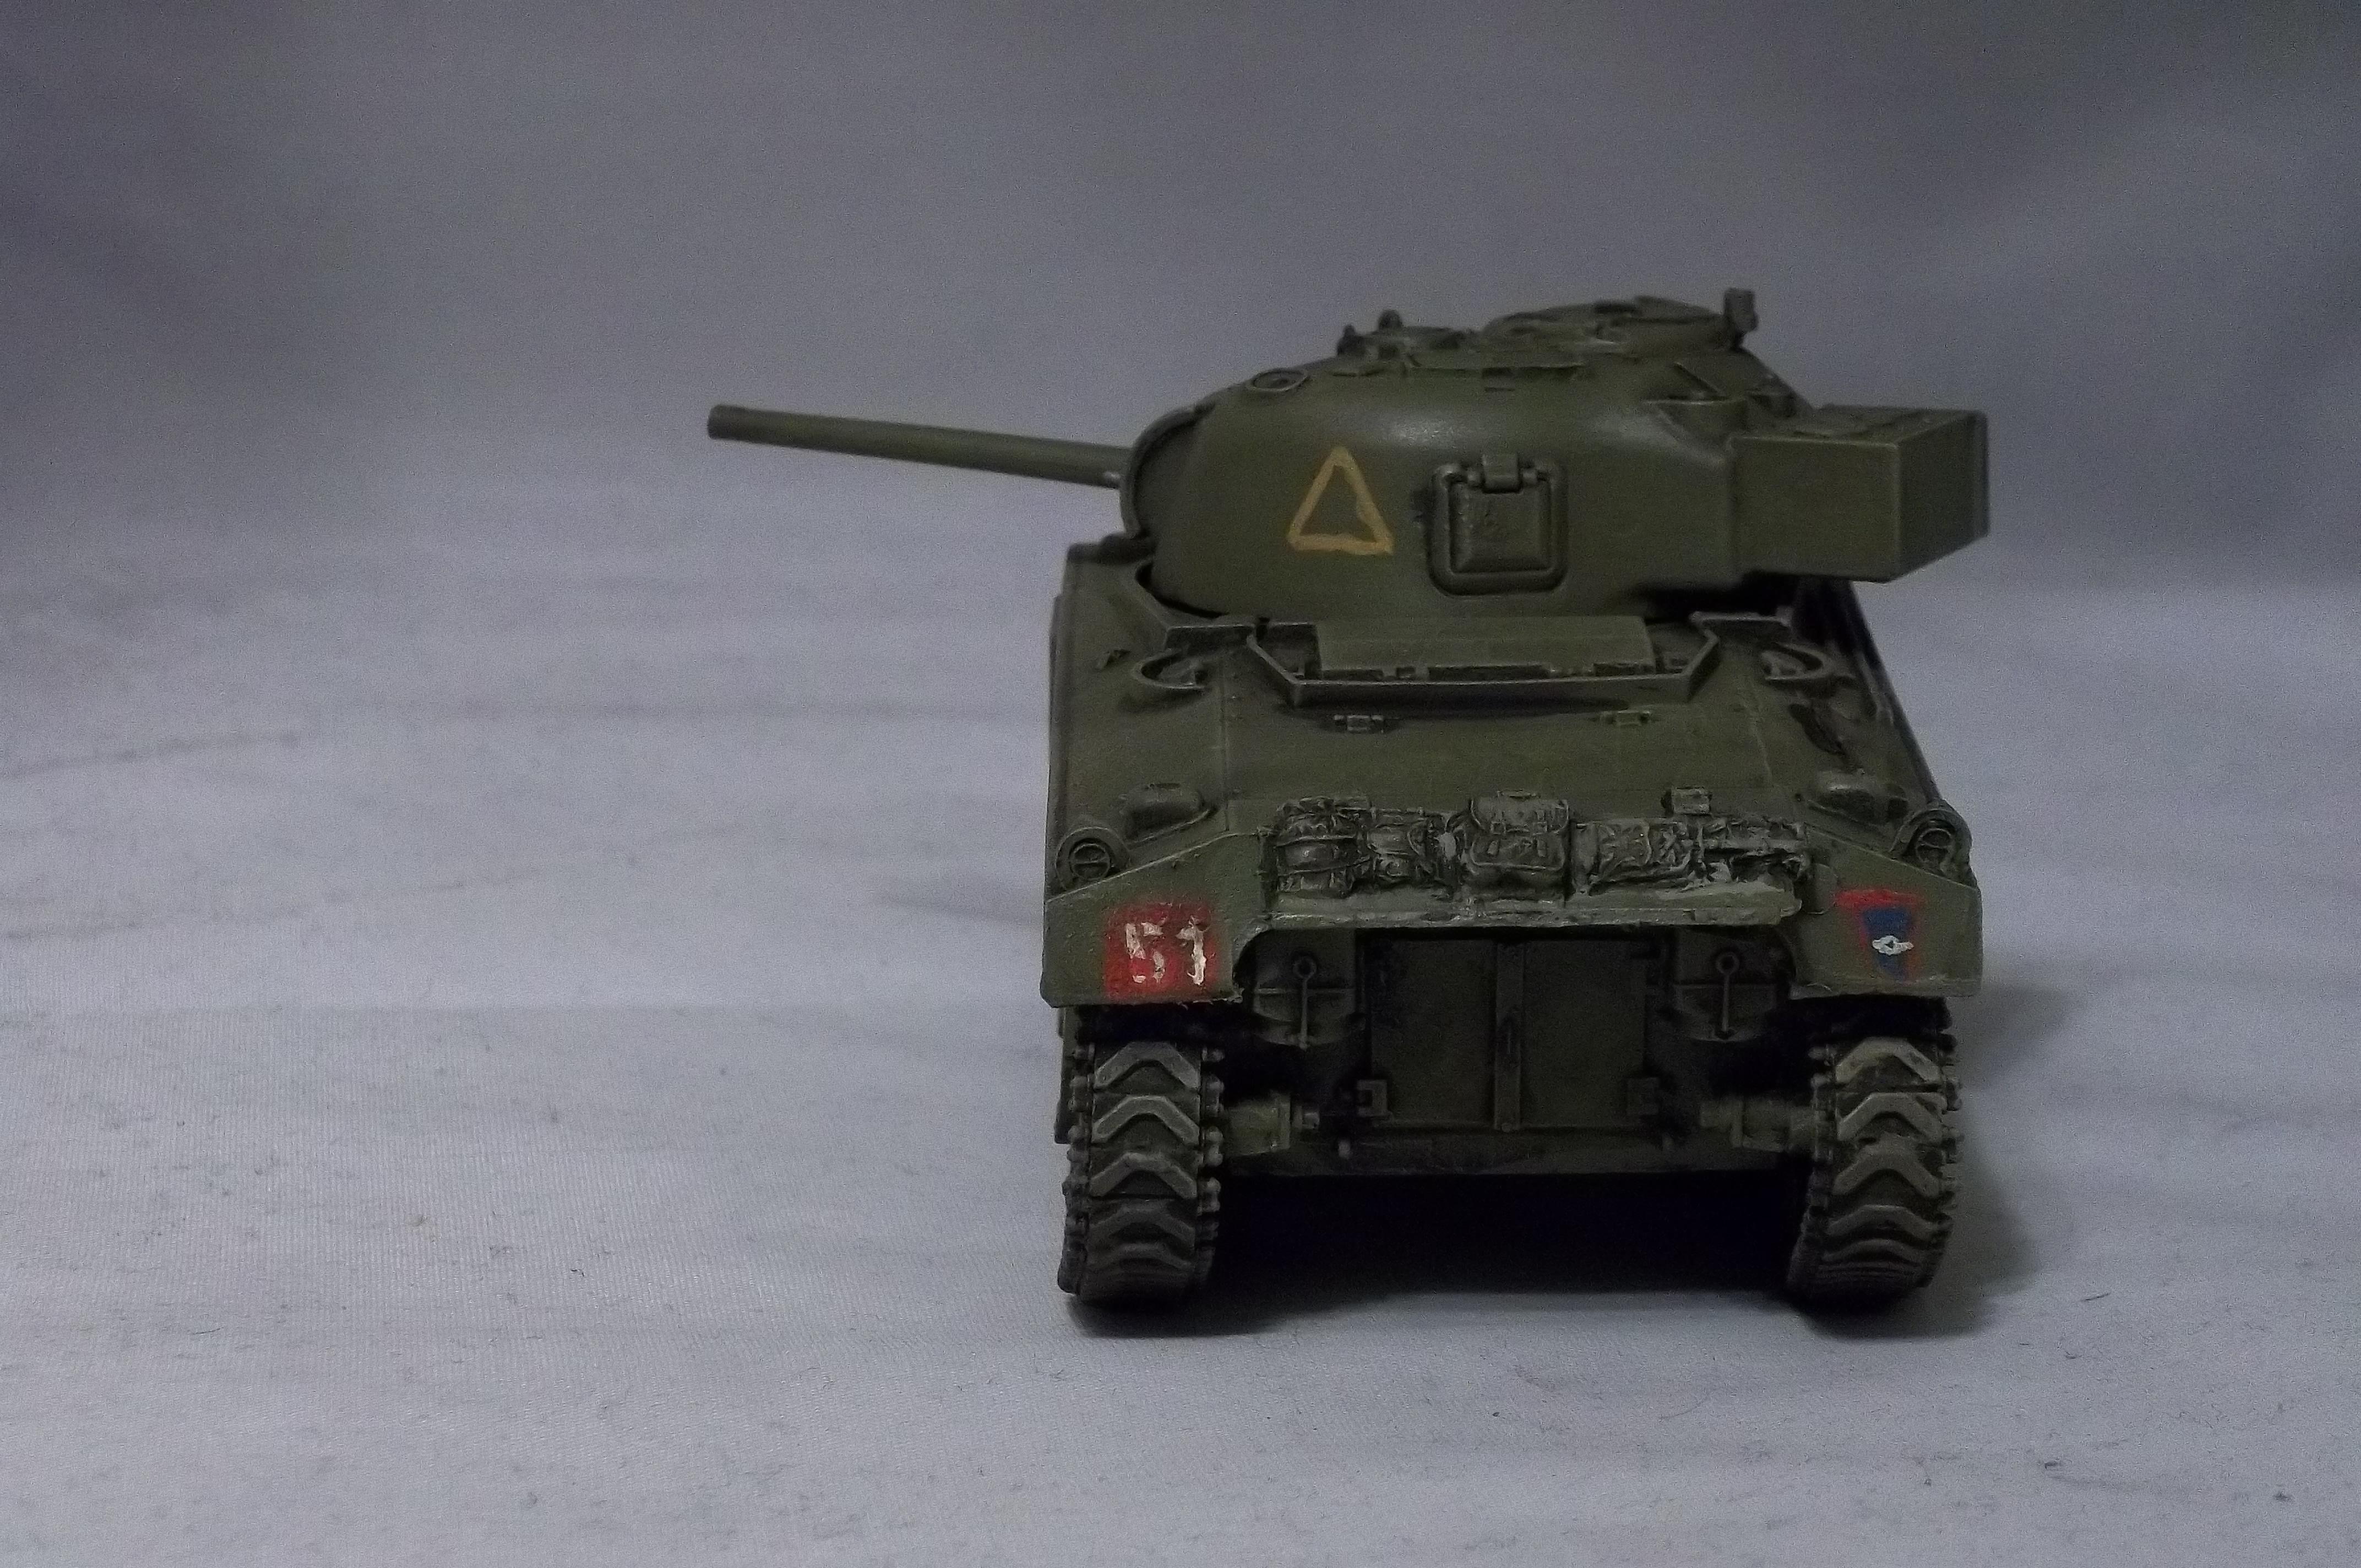 1/48th, Blitzkrieg Miniatures, Bolt Action, British, Sherman Tank, Sherman V, World War 2